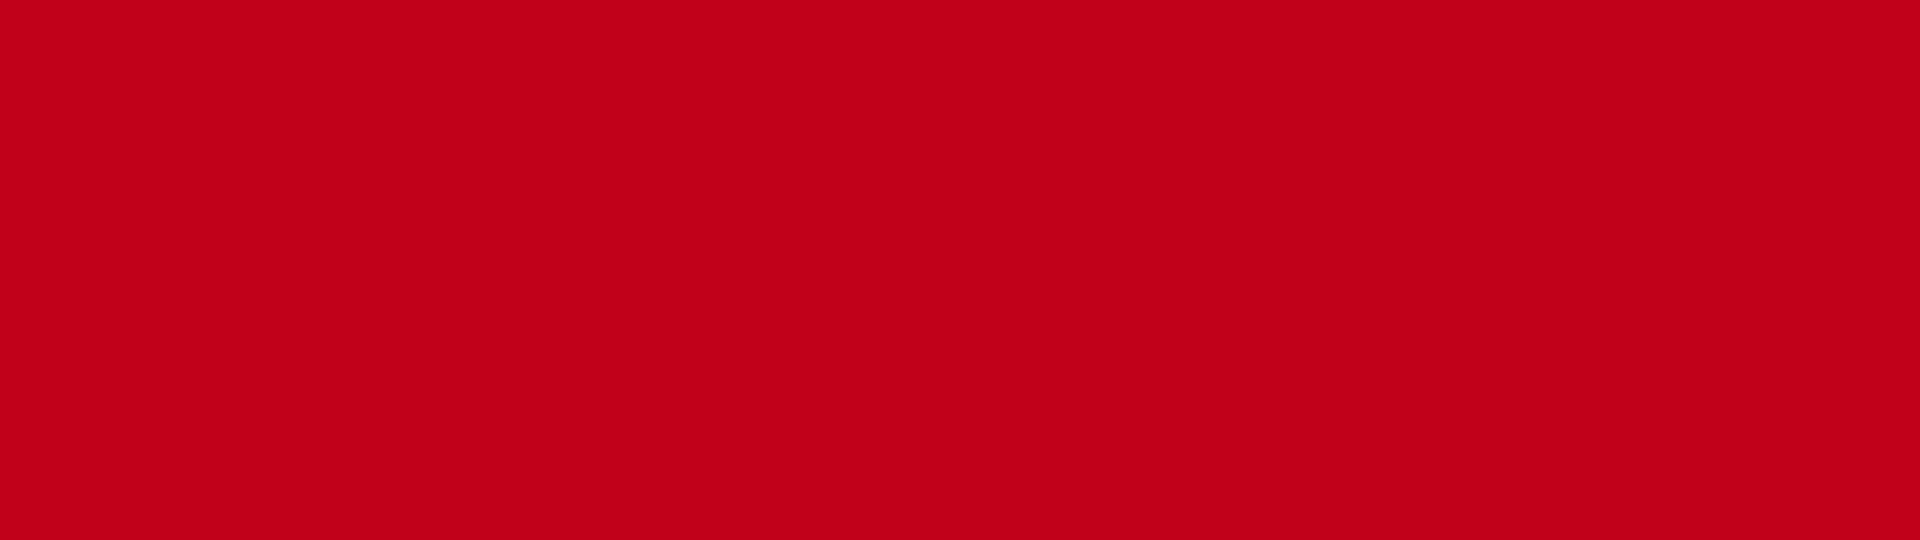 CATEGORY-SDA-119TLKAHVEMAKINELERI-17-01